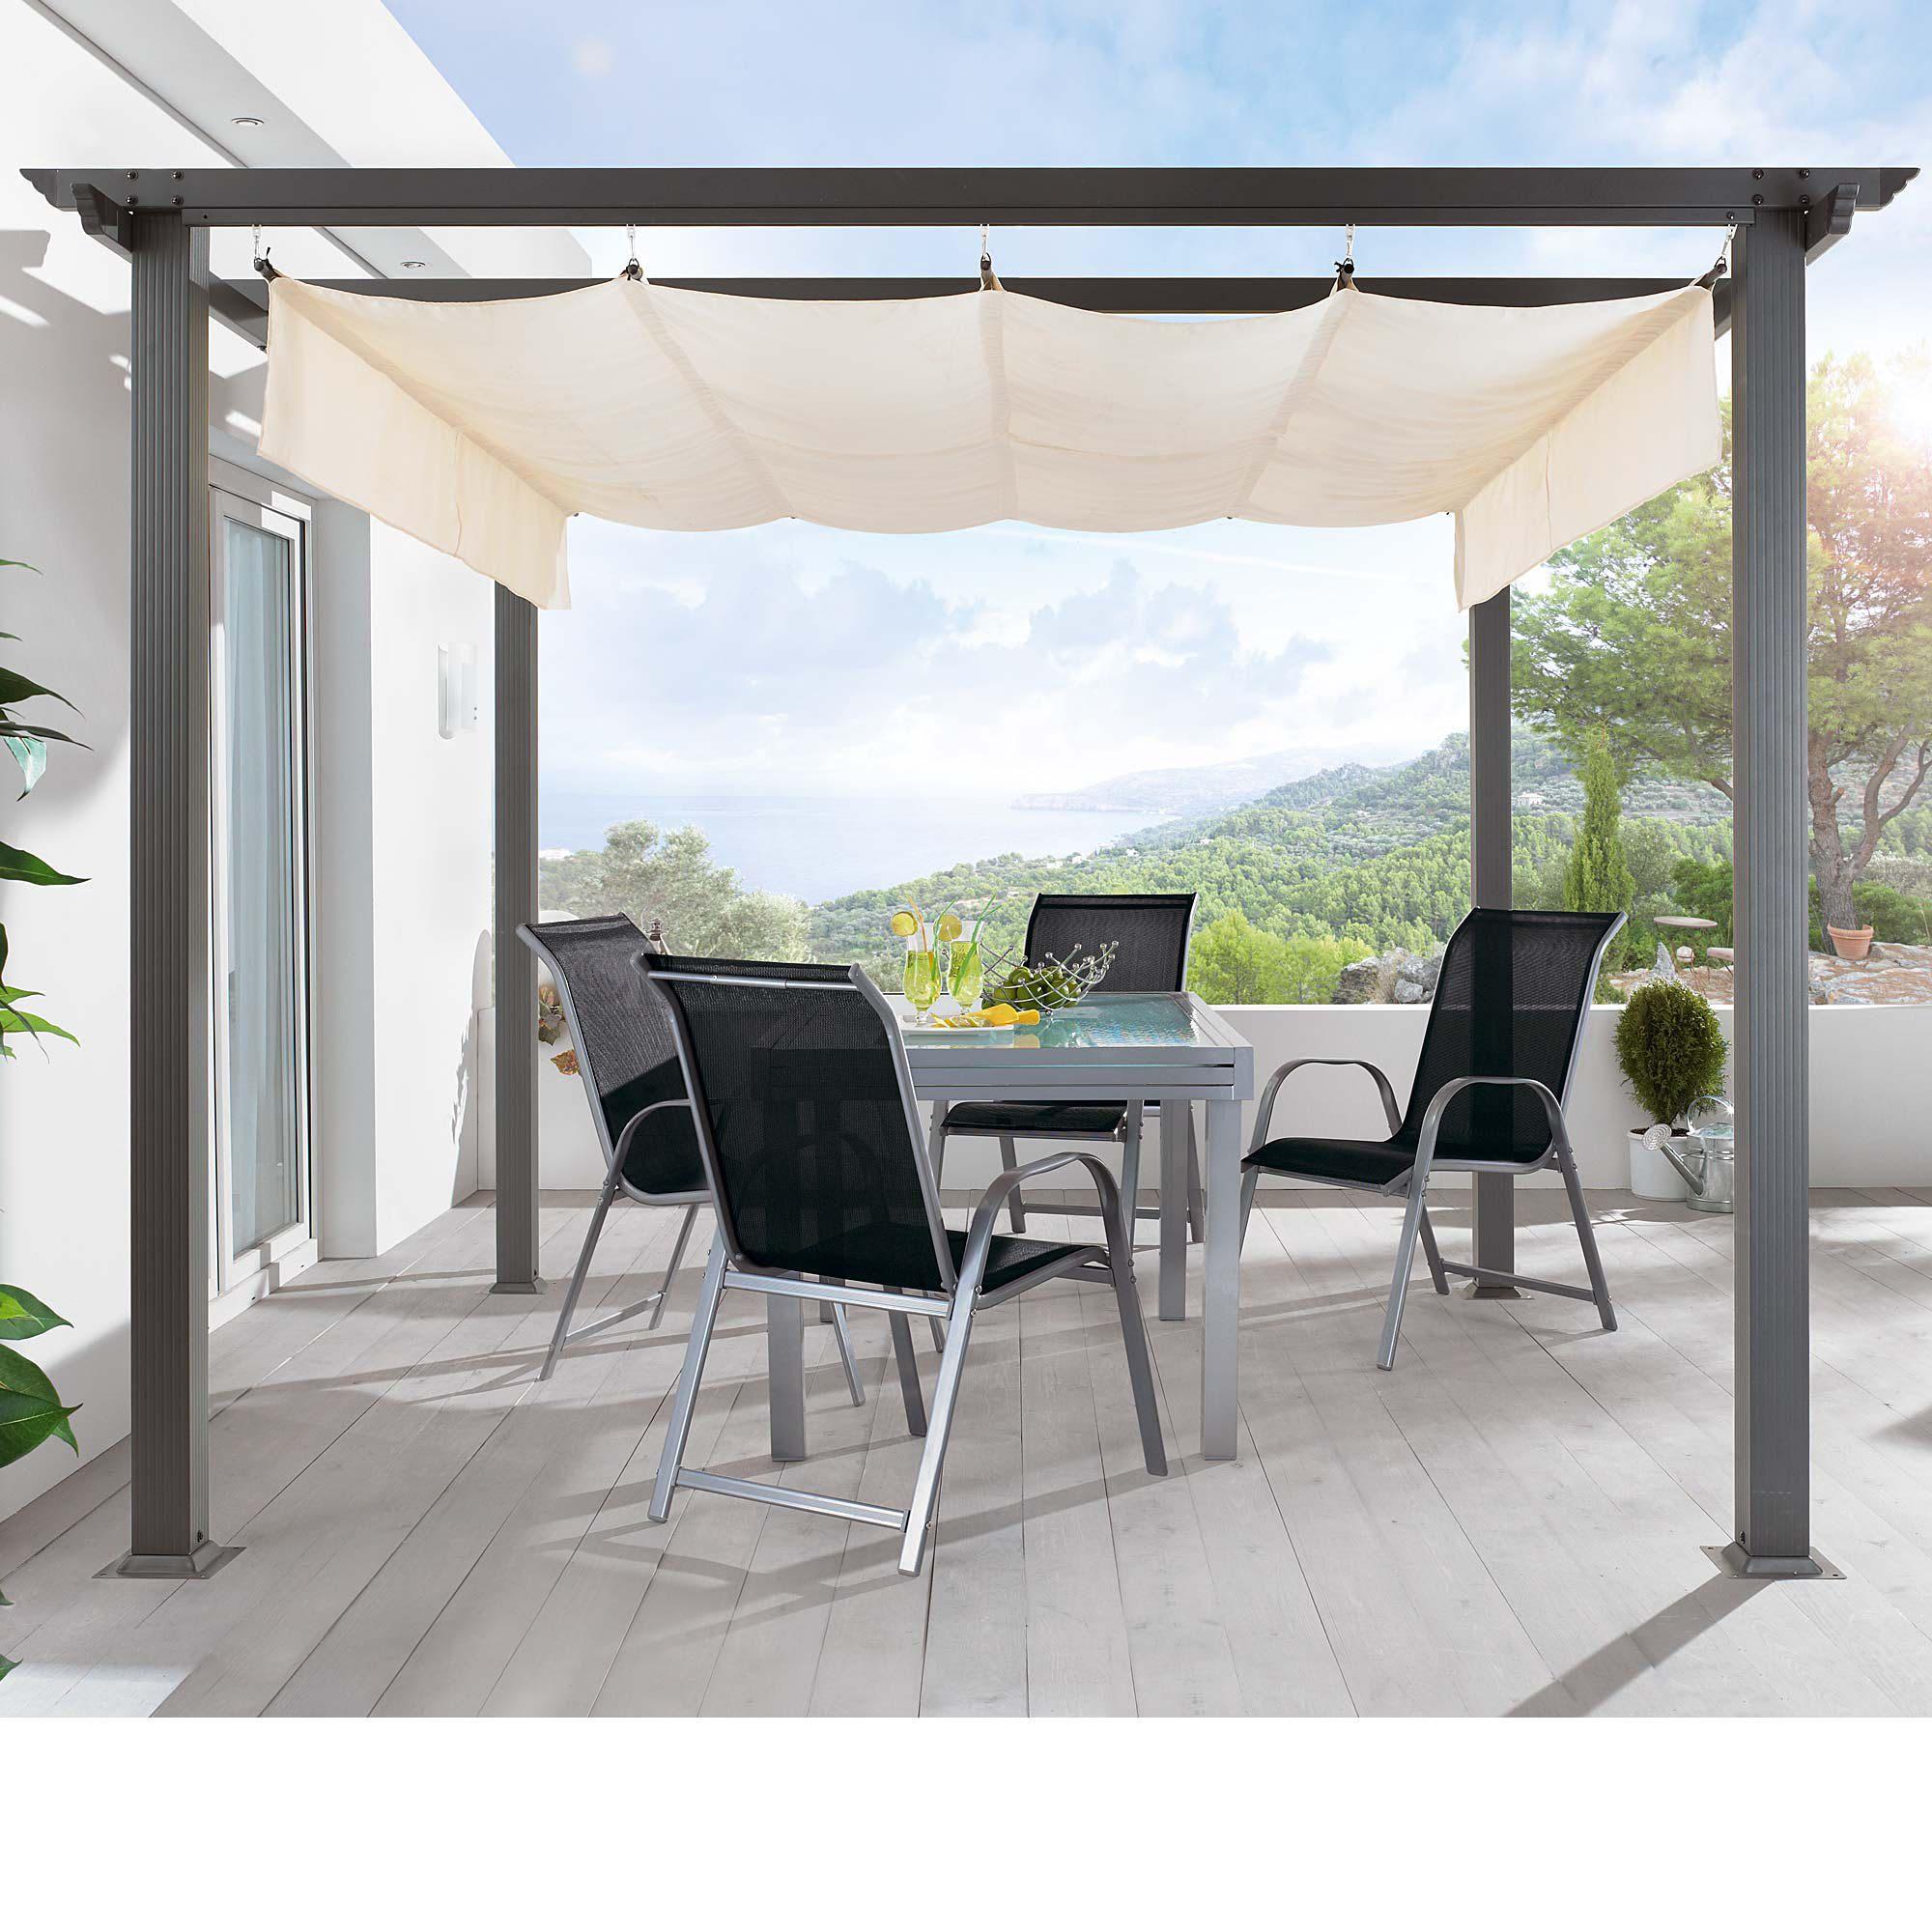 Dach Für Pergola design pergola alu pulverbeschichtetes aluminium dach 100 polyester